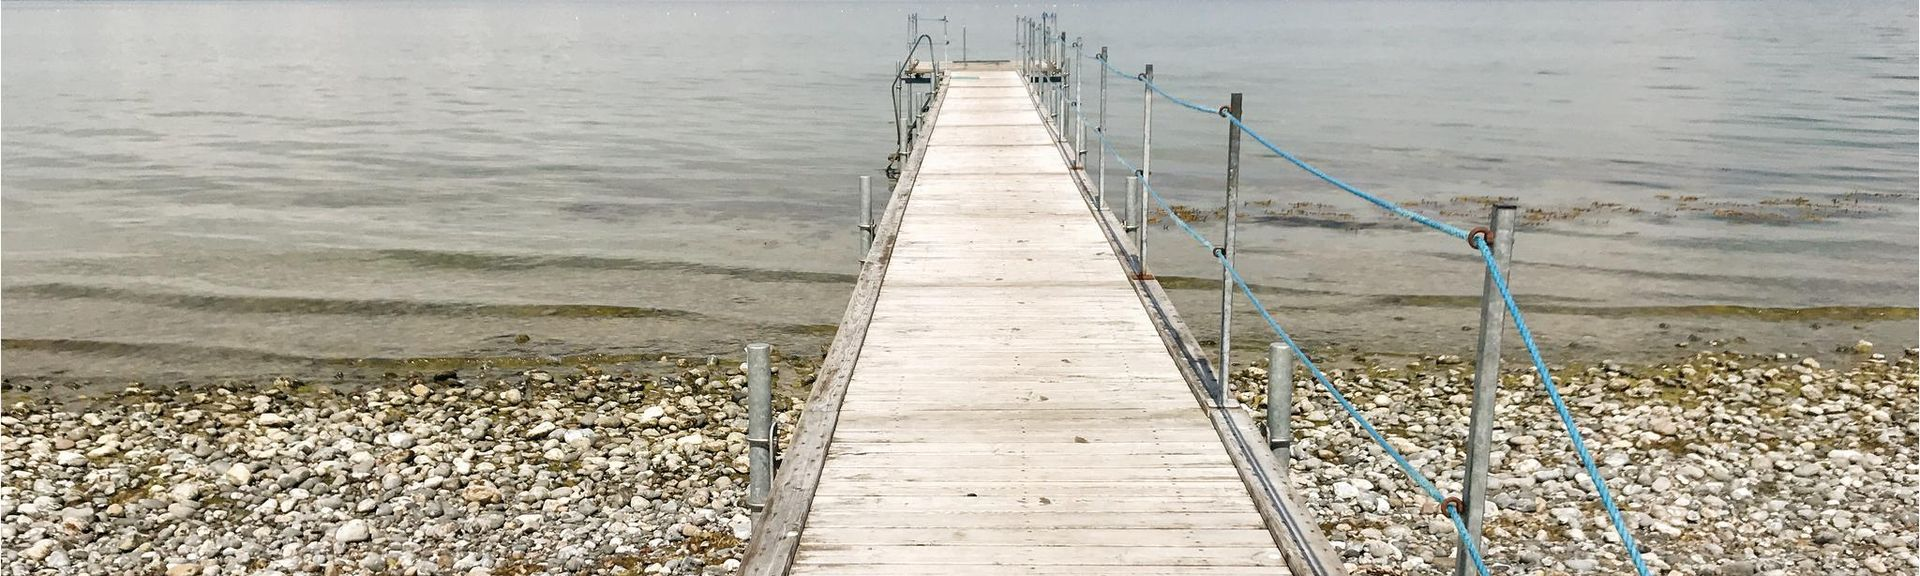 Solrød Strand, Region Sjælland, Danmark